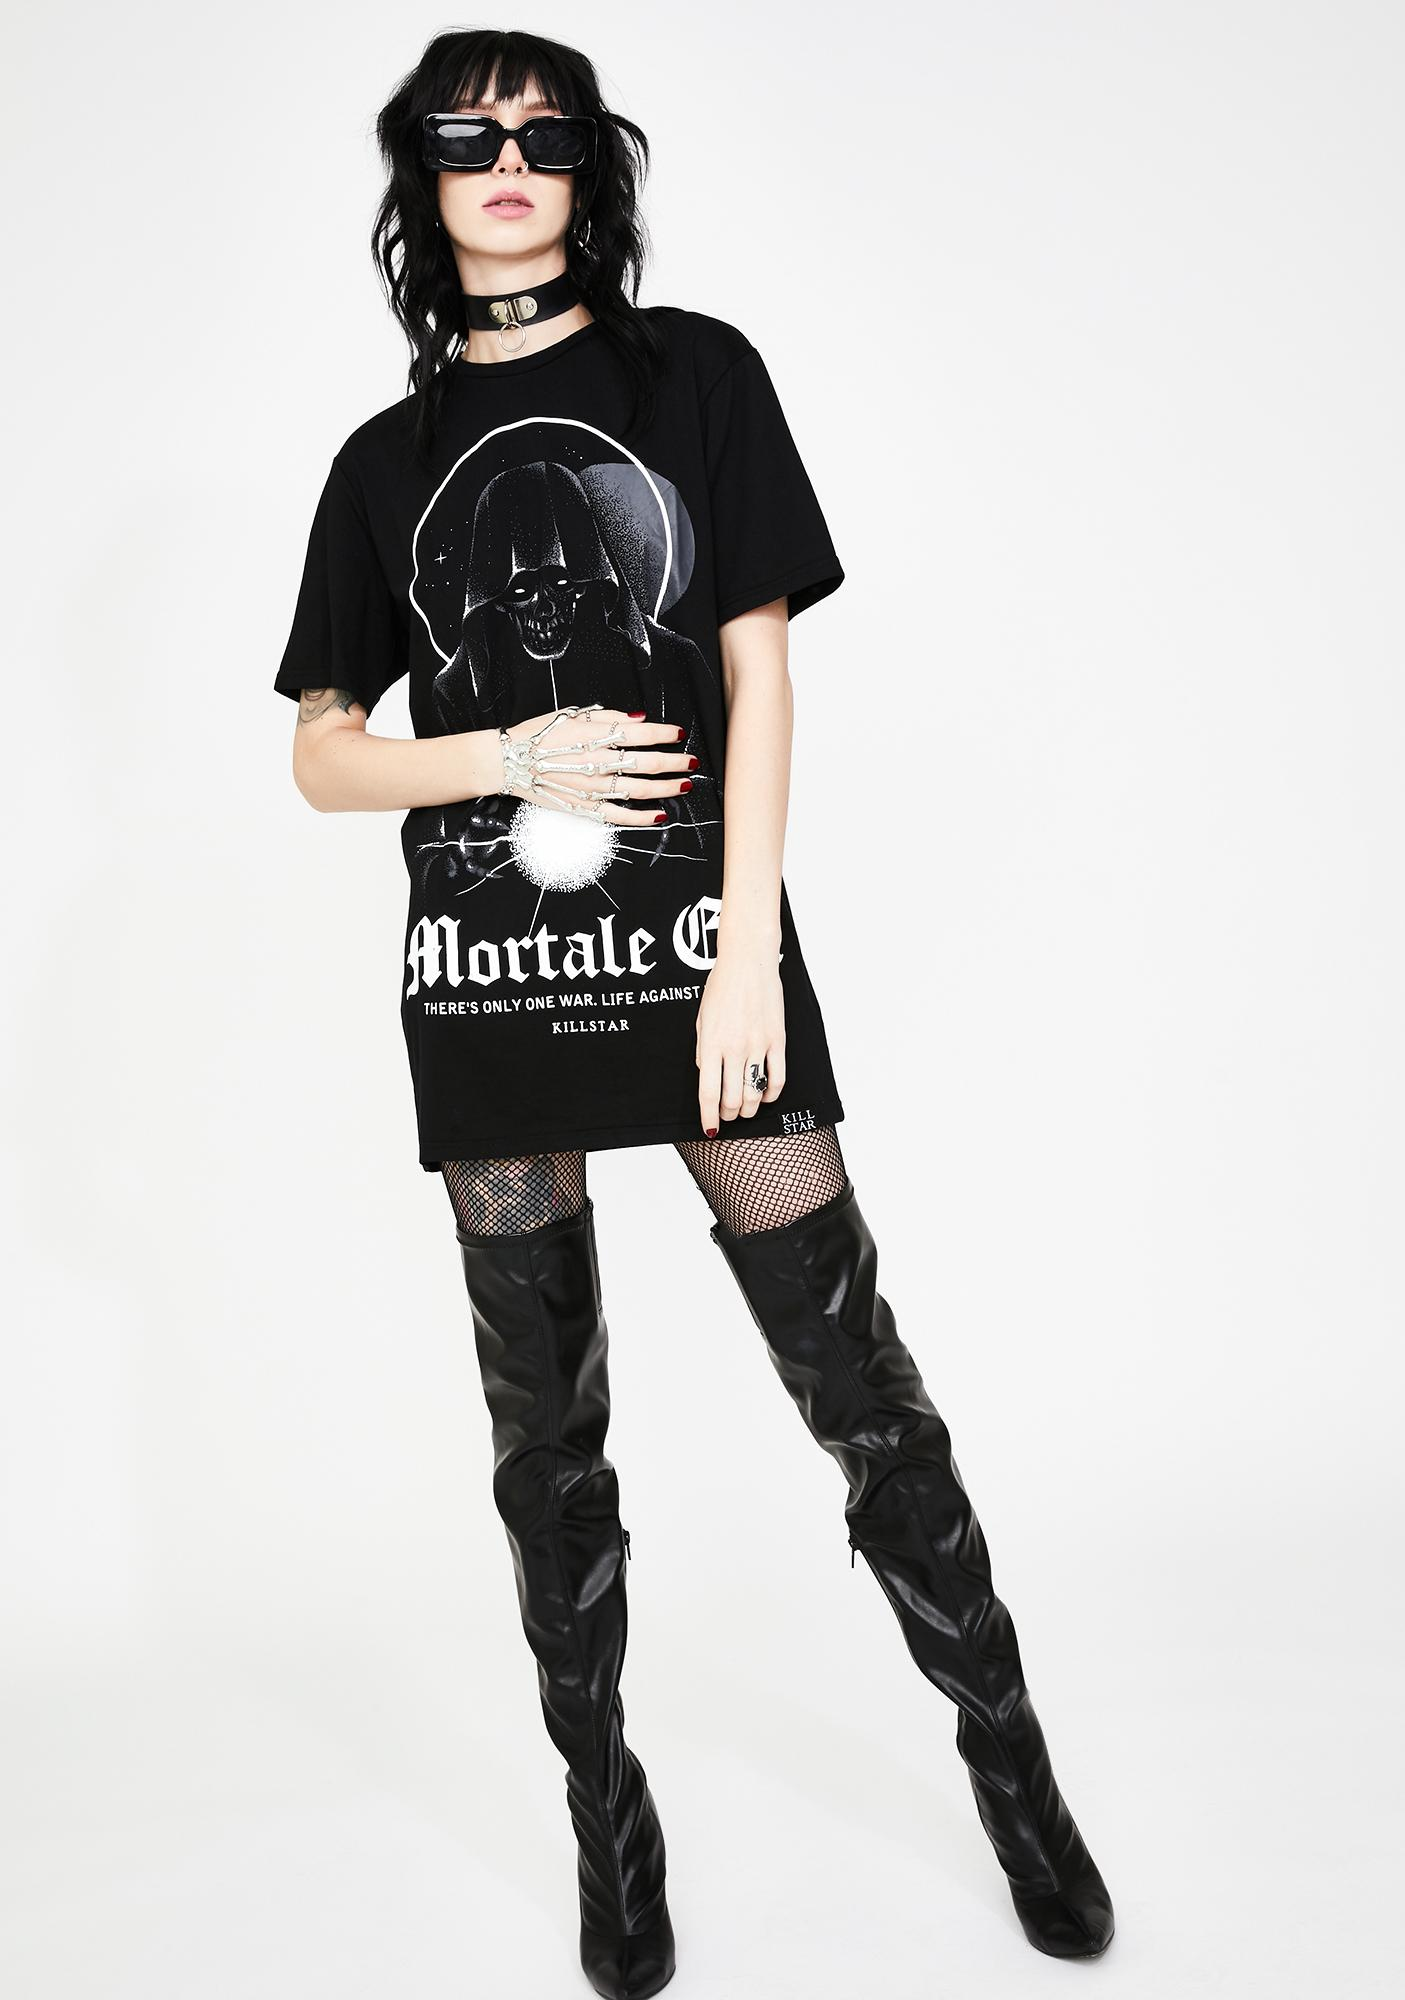 Killstar Mortale Graphic Tee